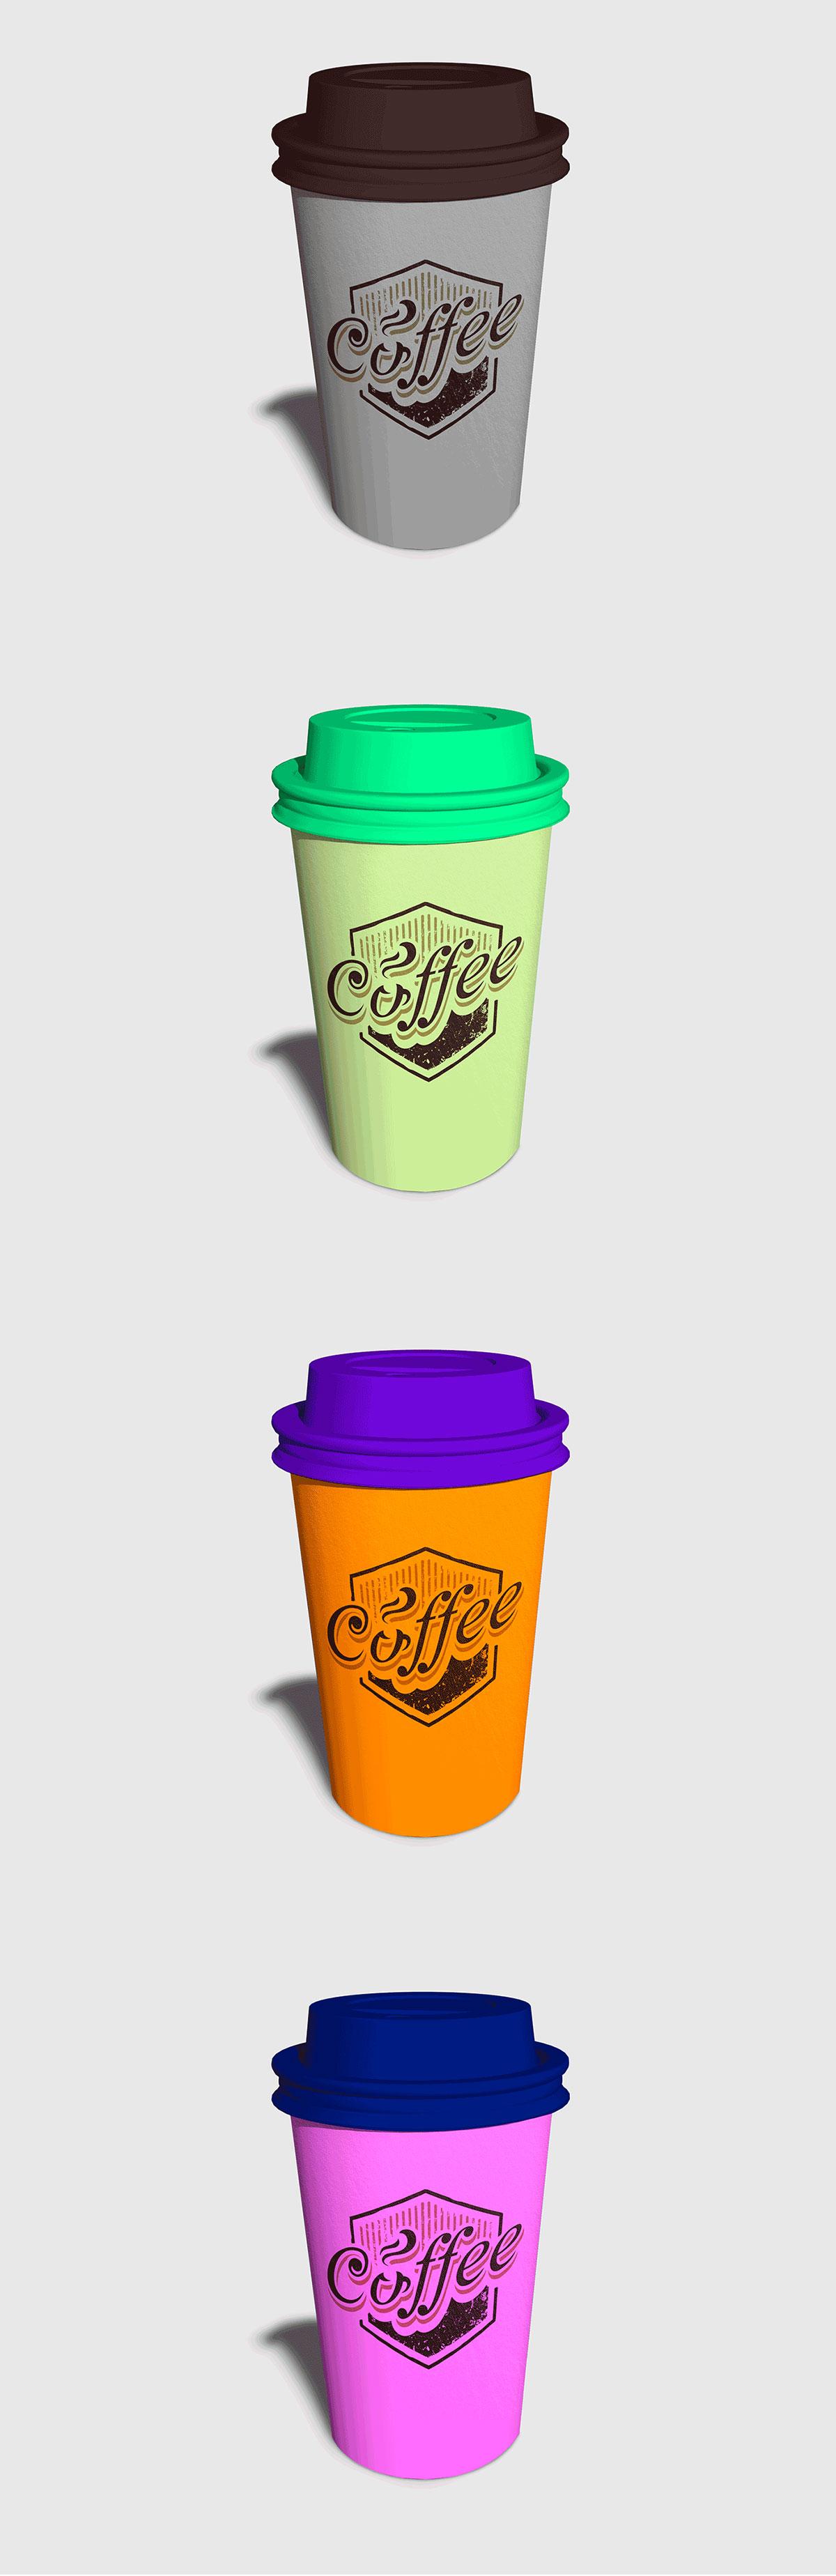 Free Coffee Cup Photorealistic Mockup